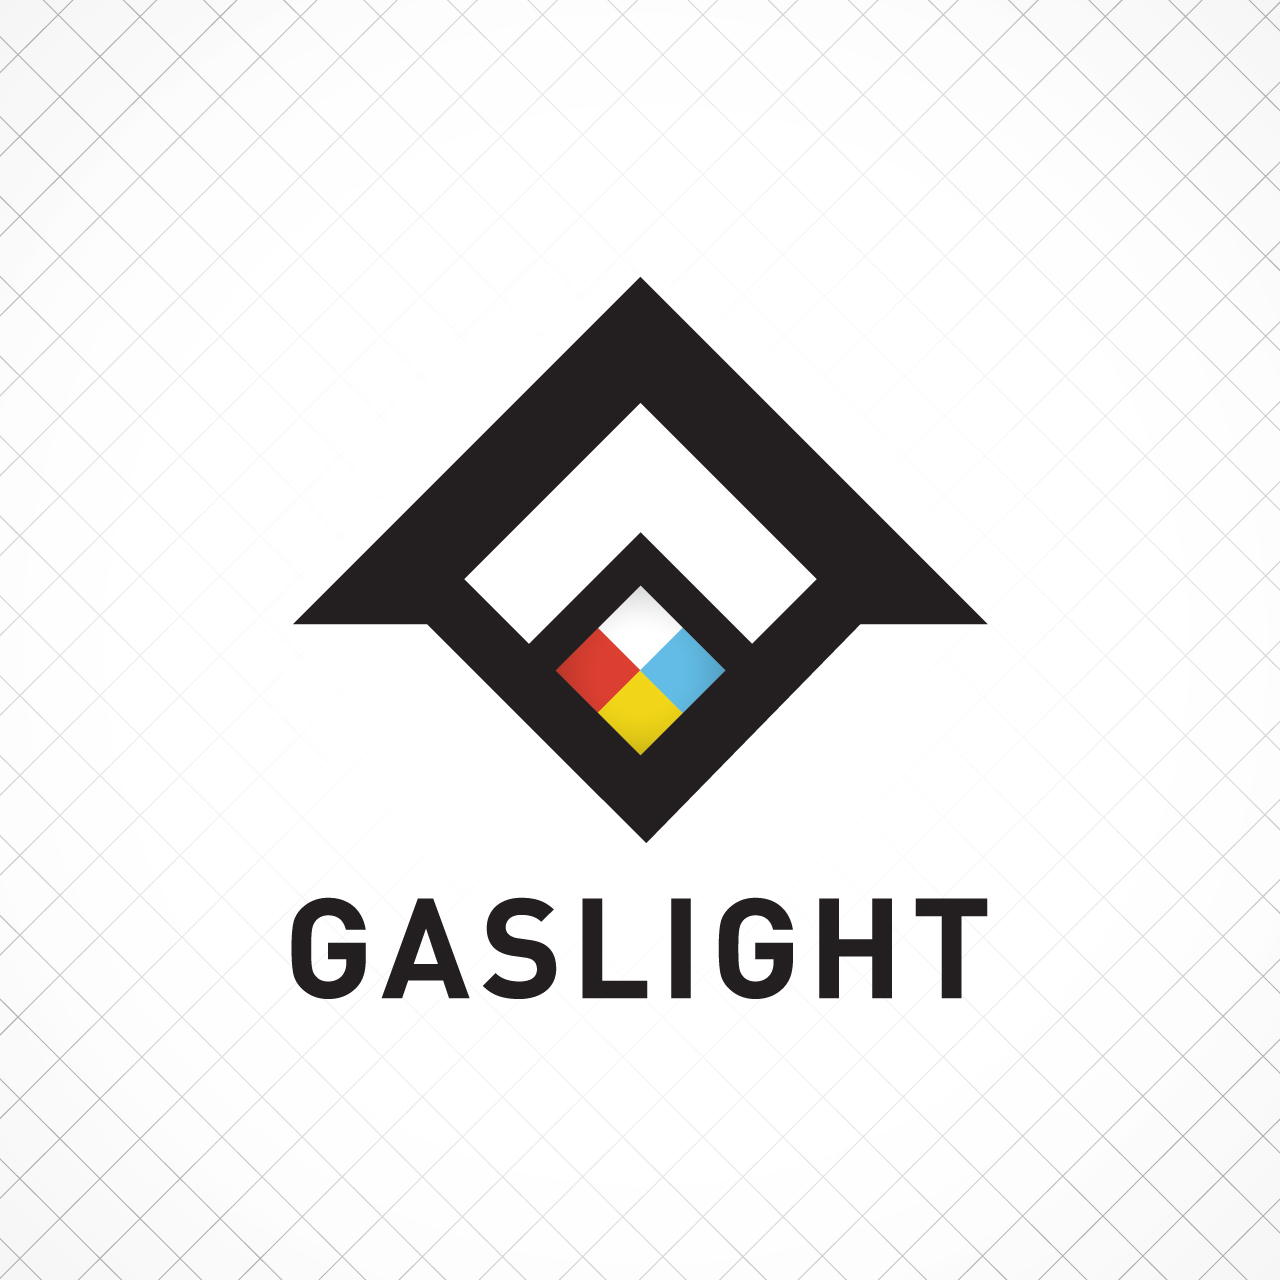 The Gaslight Podcast